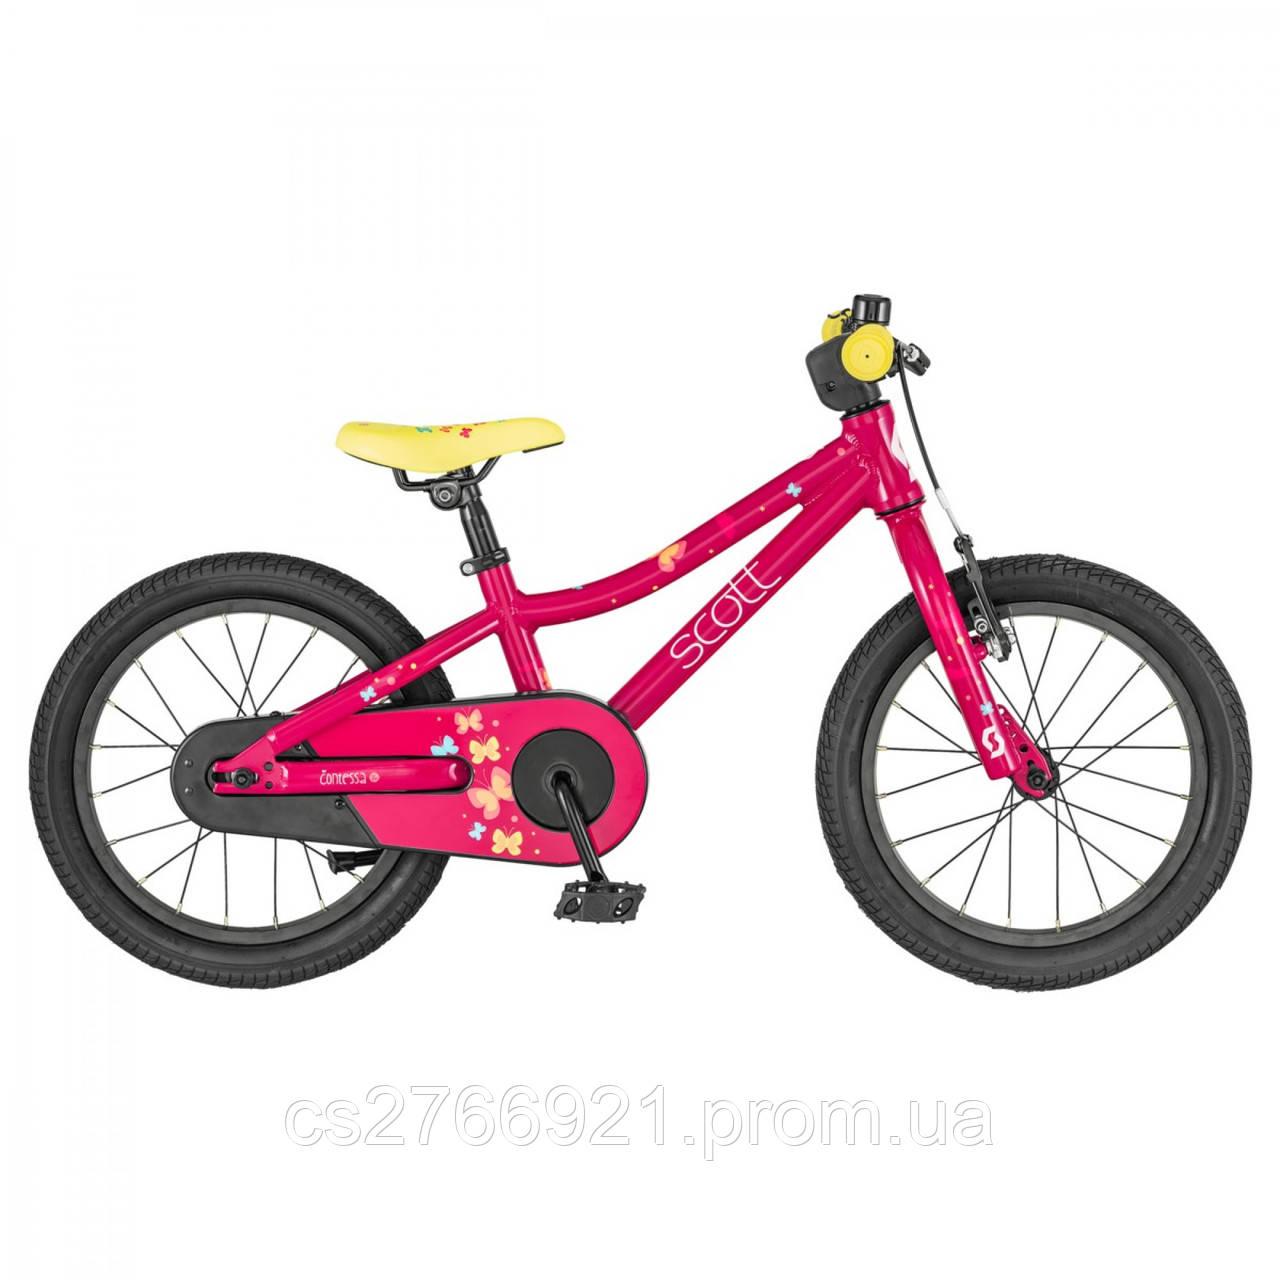 Велосипед SCOTT Contessa 16 (CN) 19